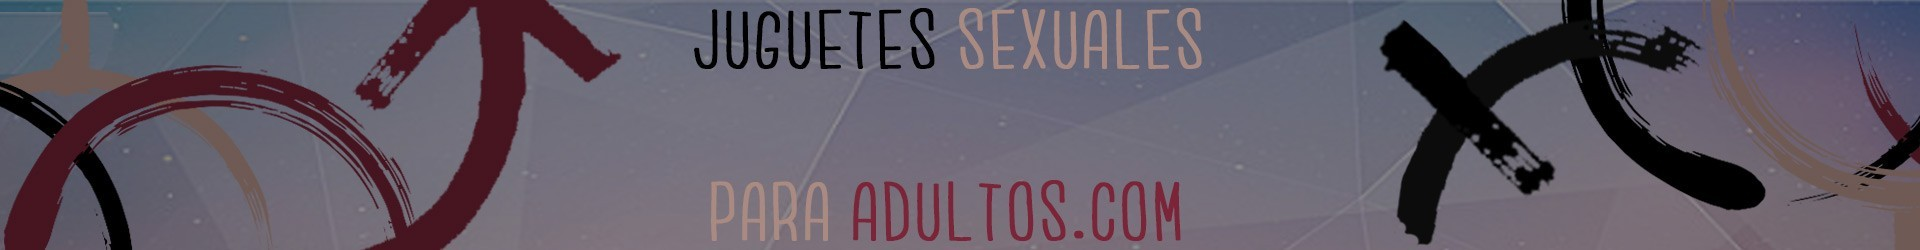 BDSM / Collares - Juguetes Sexuales para Adultos